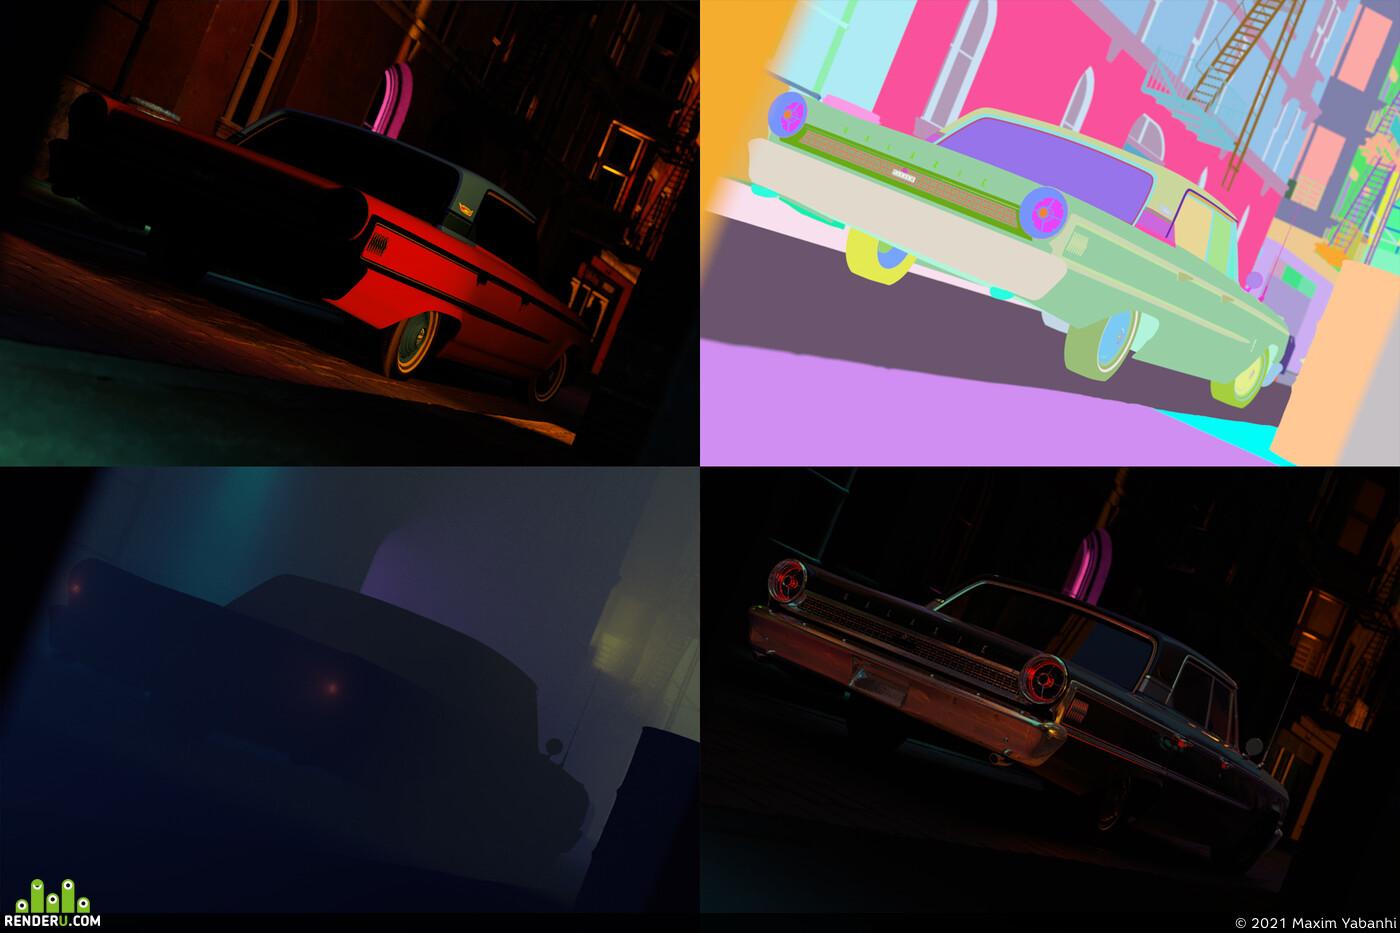 3D Studio Max, Corona Renderer, Corona Displacement, 3dsmax,corona,, Exterior 3d visualization Corona Renderer corona 1.7 coronarenderer, Adobe Photoshop, Photoshop, FULL CGI